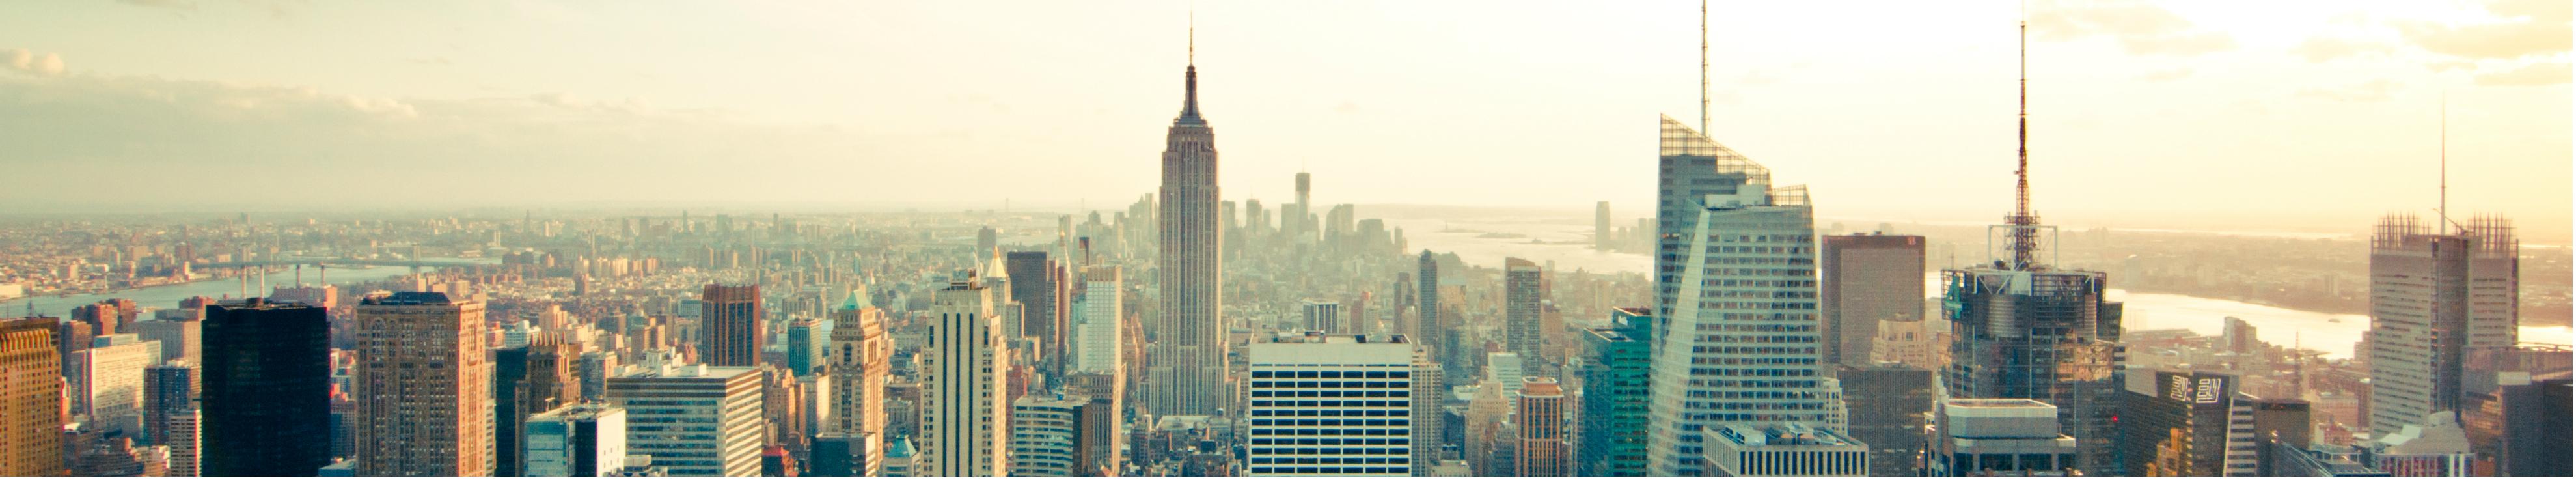 skyline-buildings-new-york-skyscrapers-3